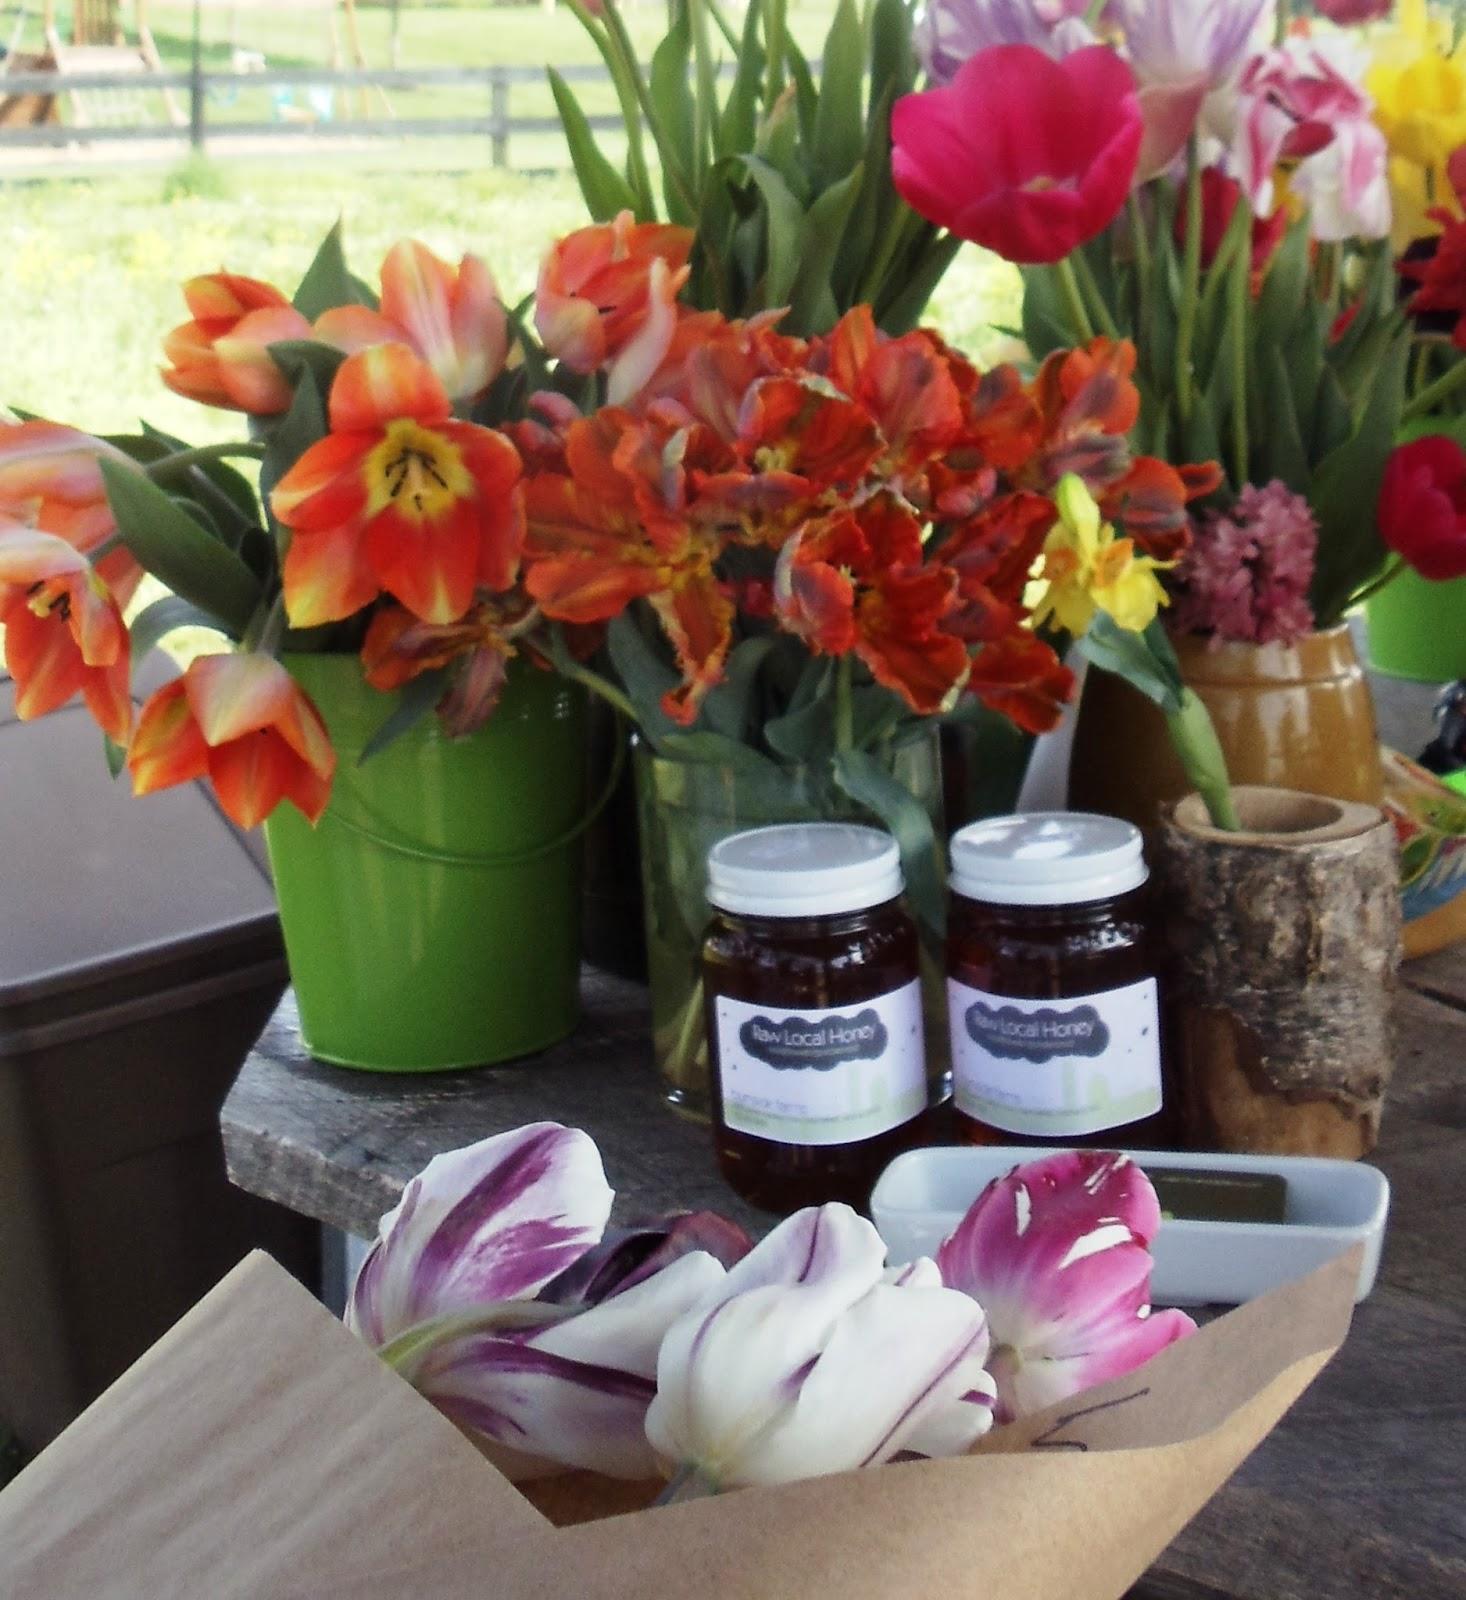 Tulips and jars of honey